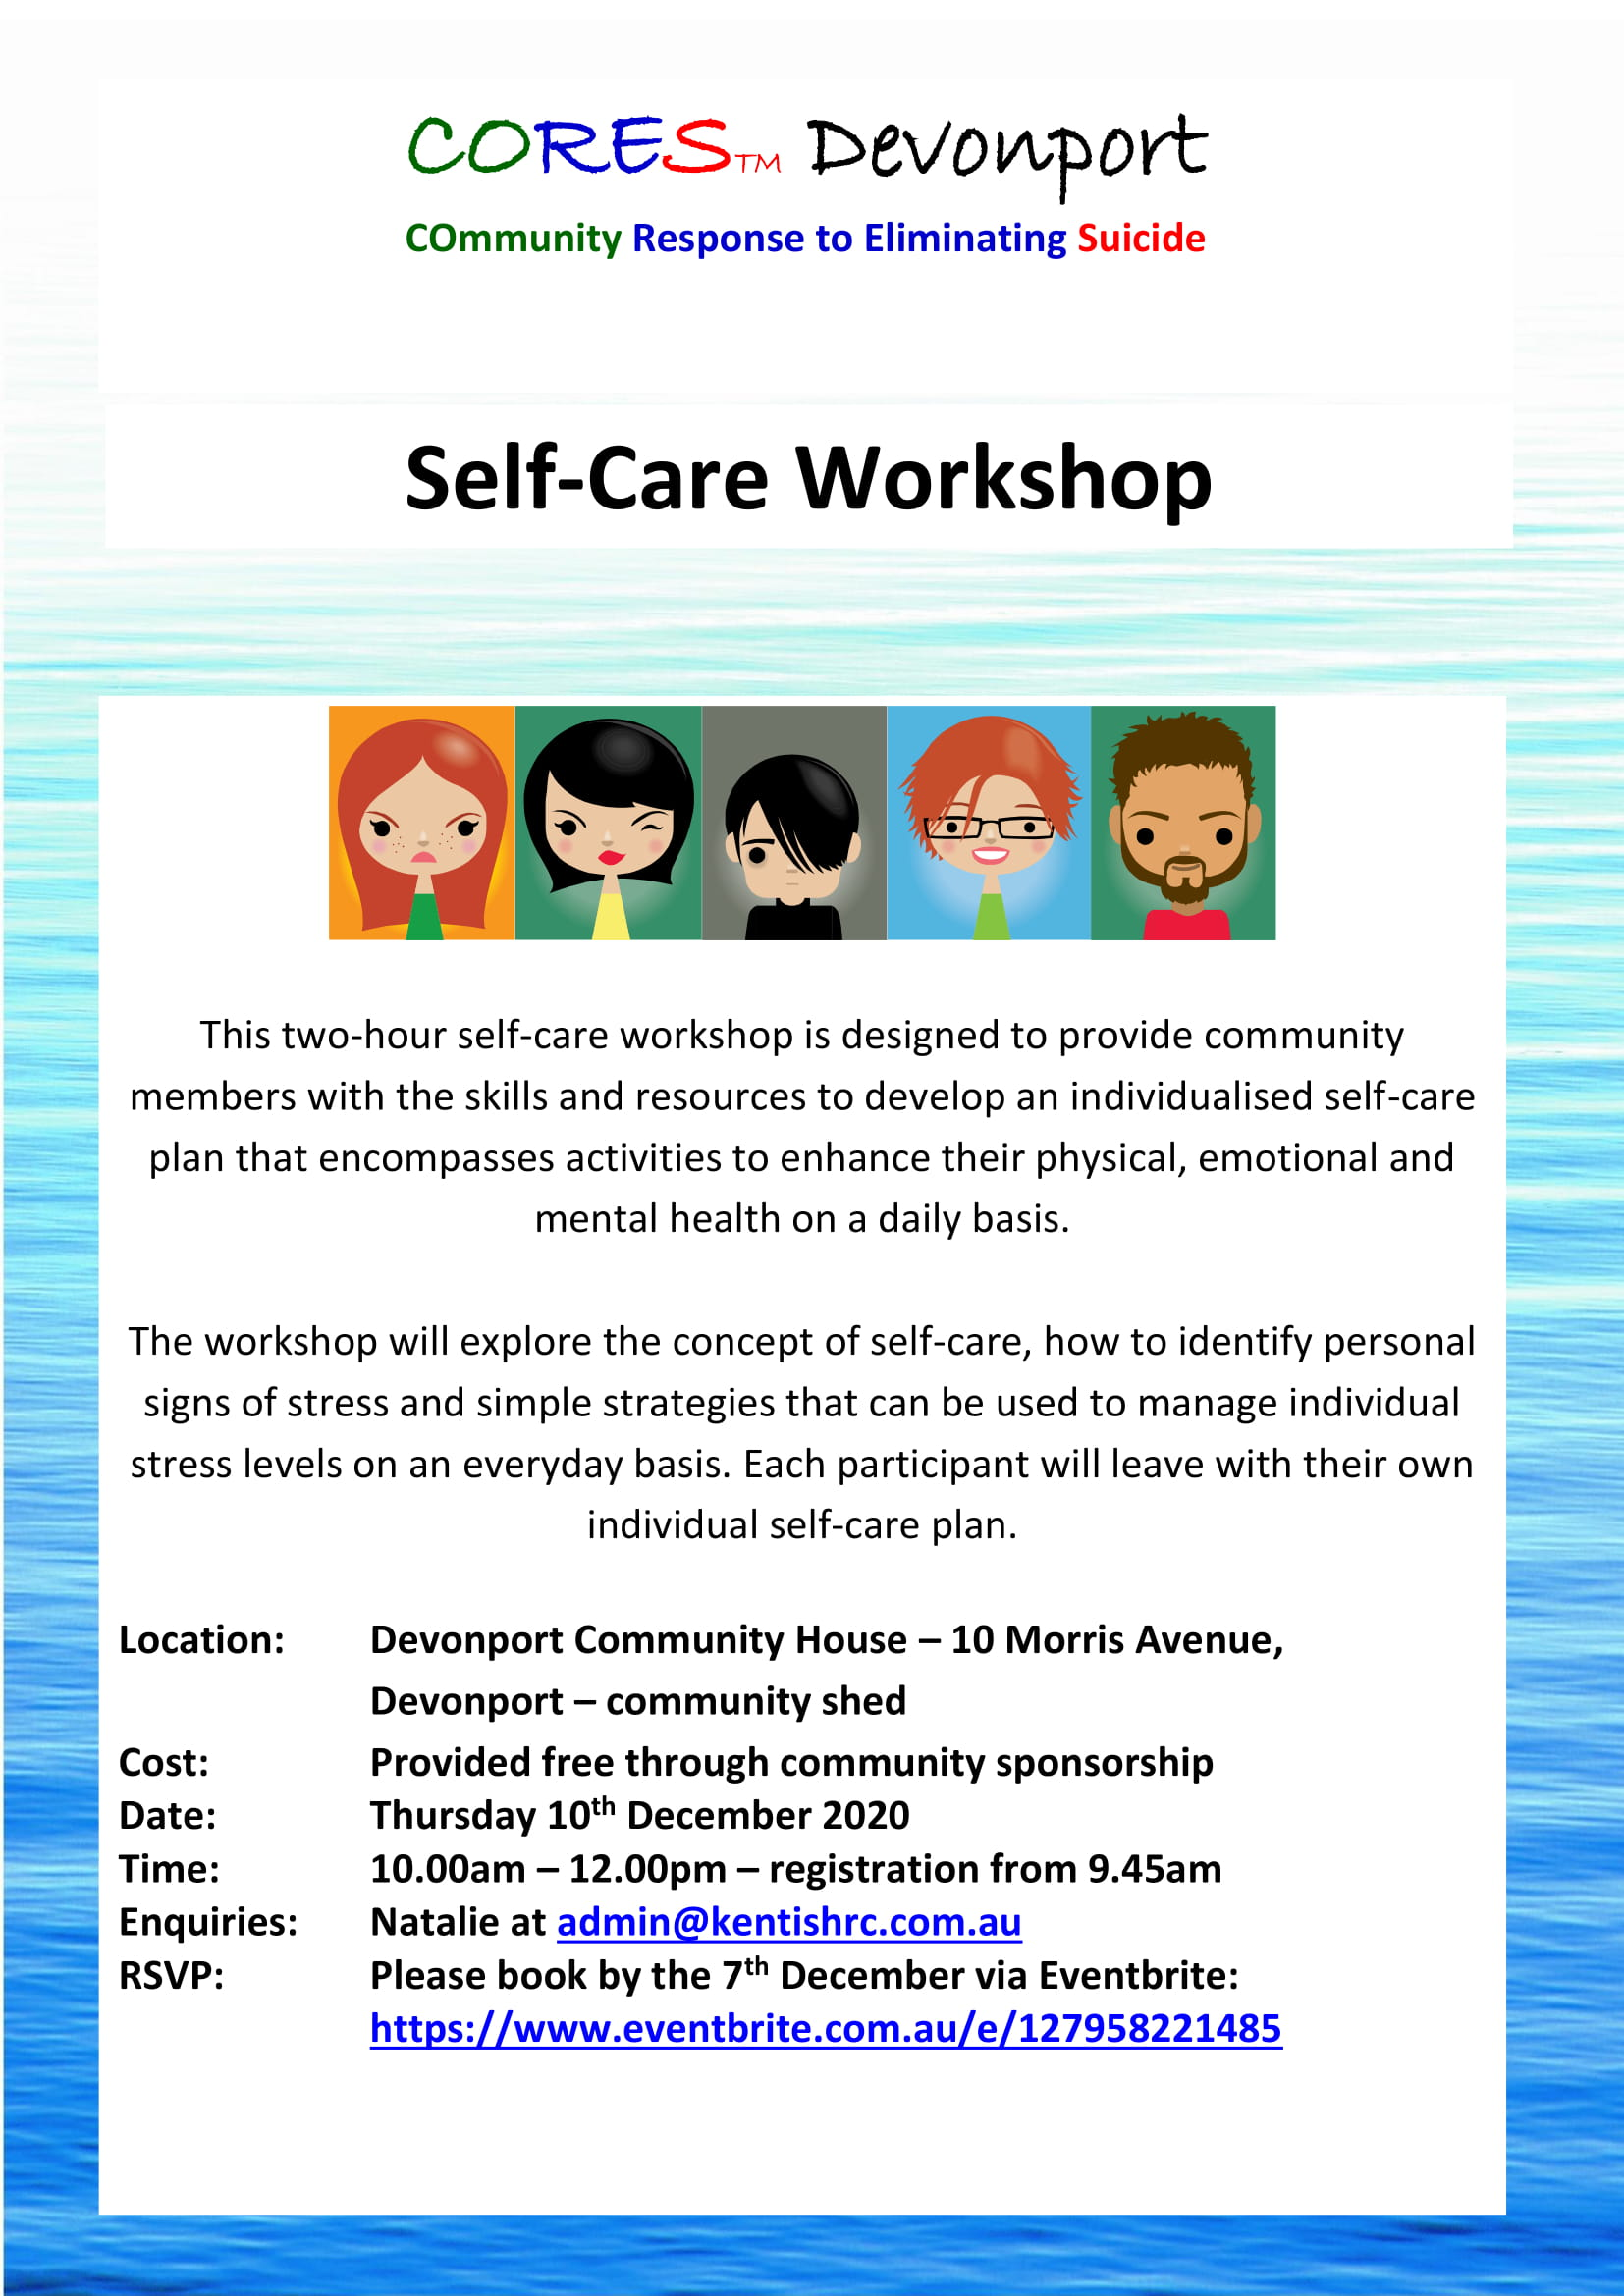 CORES Self-Care Devonport December 2020 fb